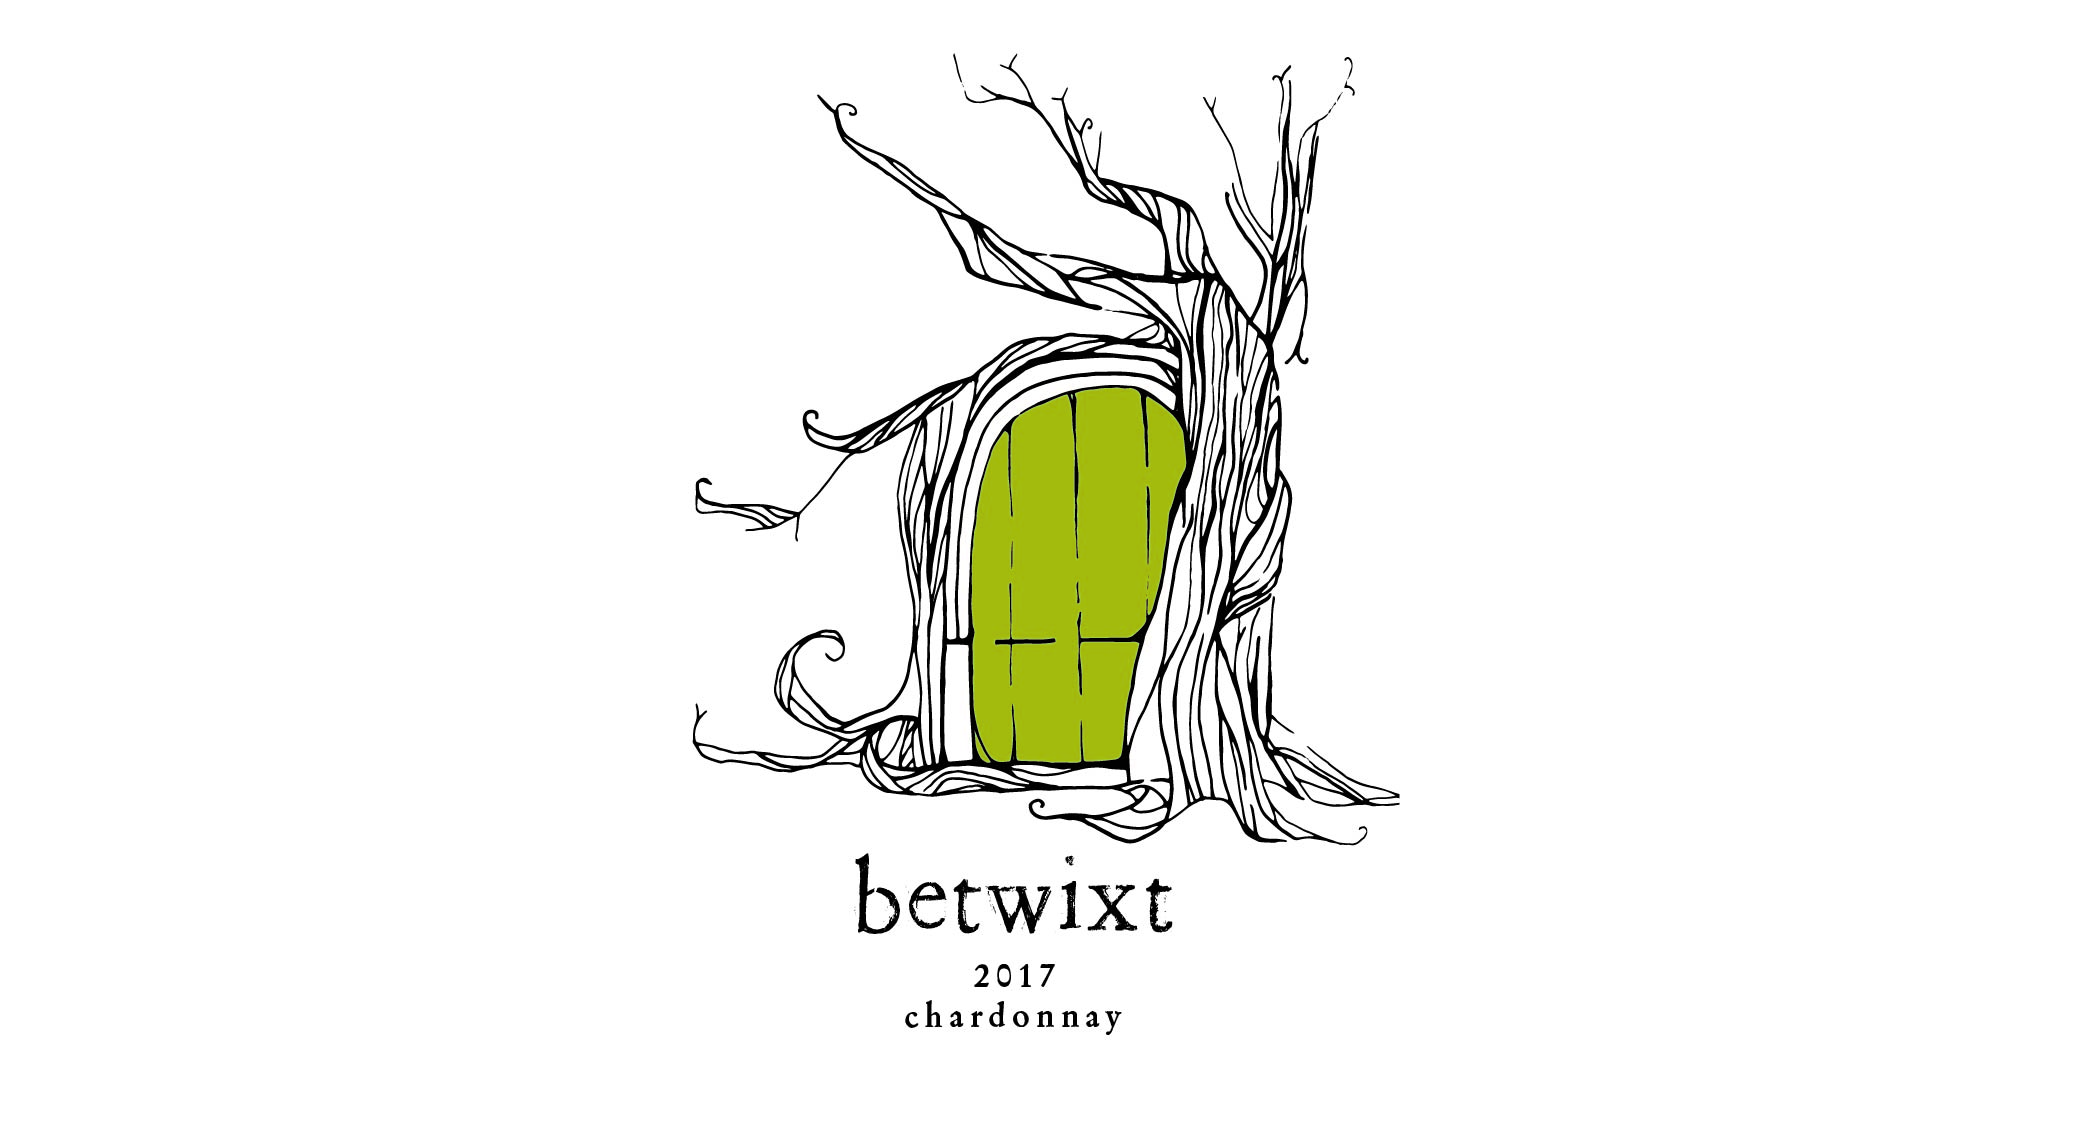 betwixt_rbr_chardonnay_2017_whitebackground